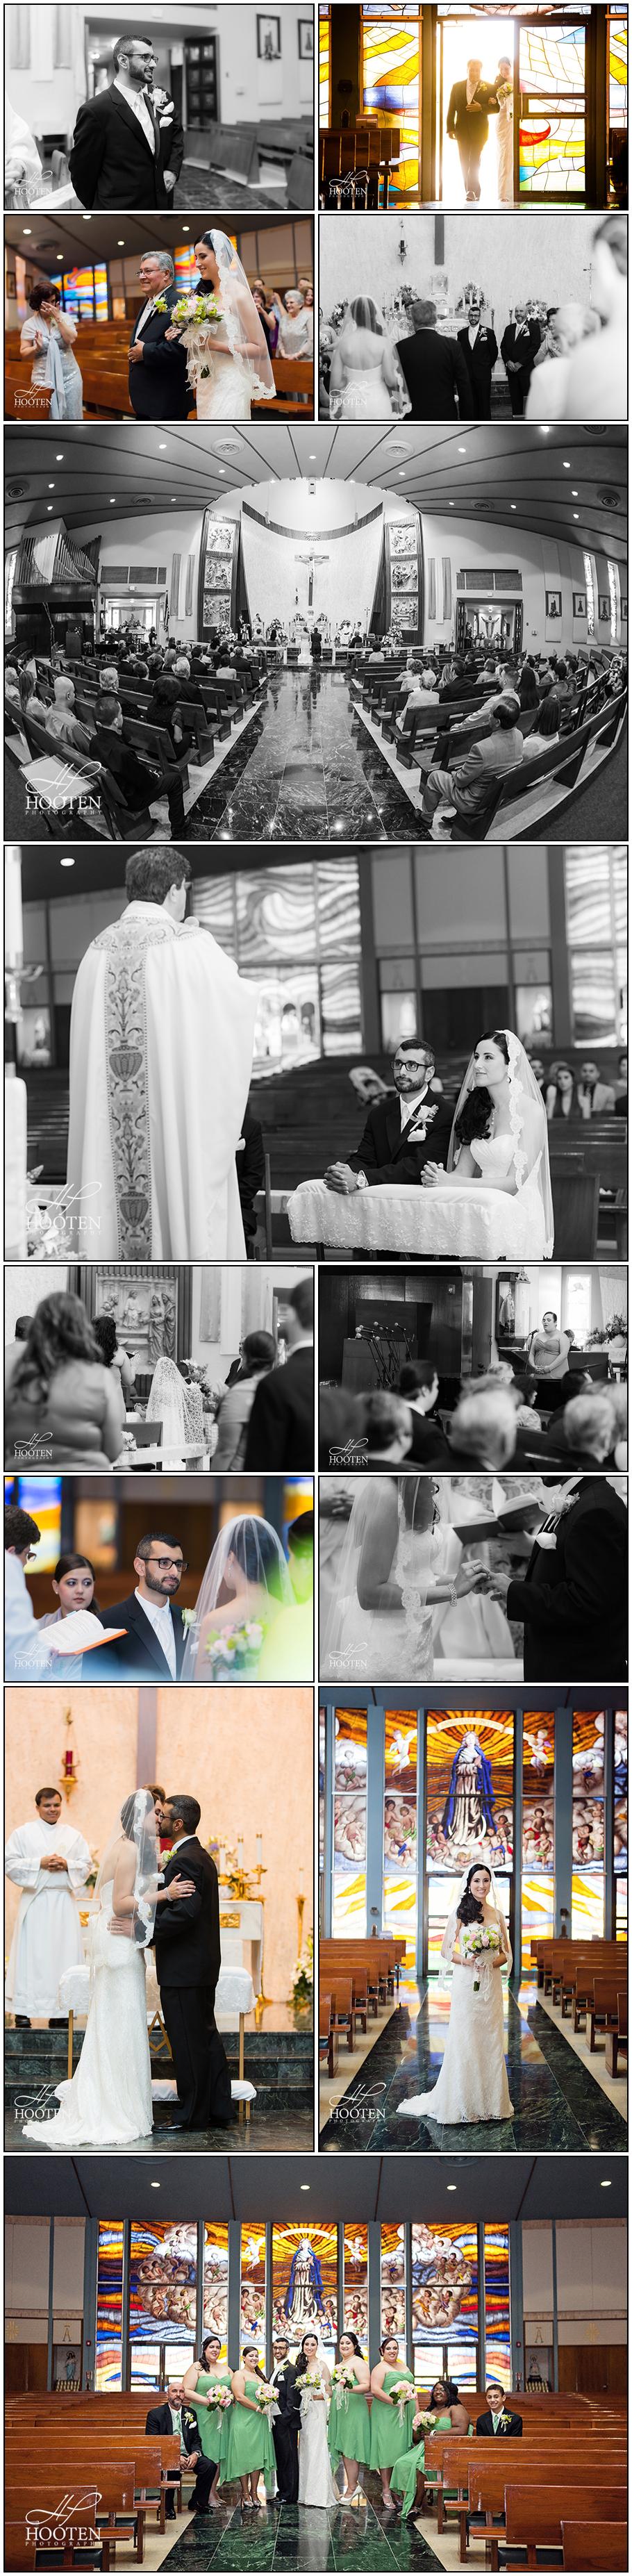 Miami-Wedding-Photography-Immaculate-Conception-Catholic-Church-Ceremony-Photo.jpg